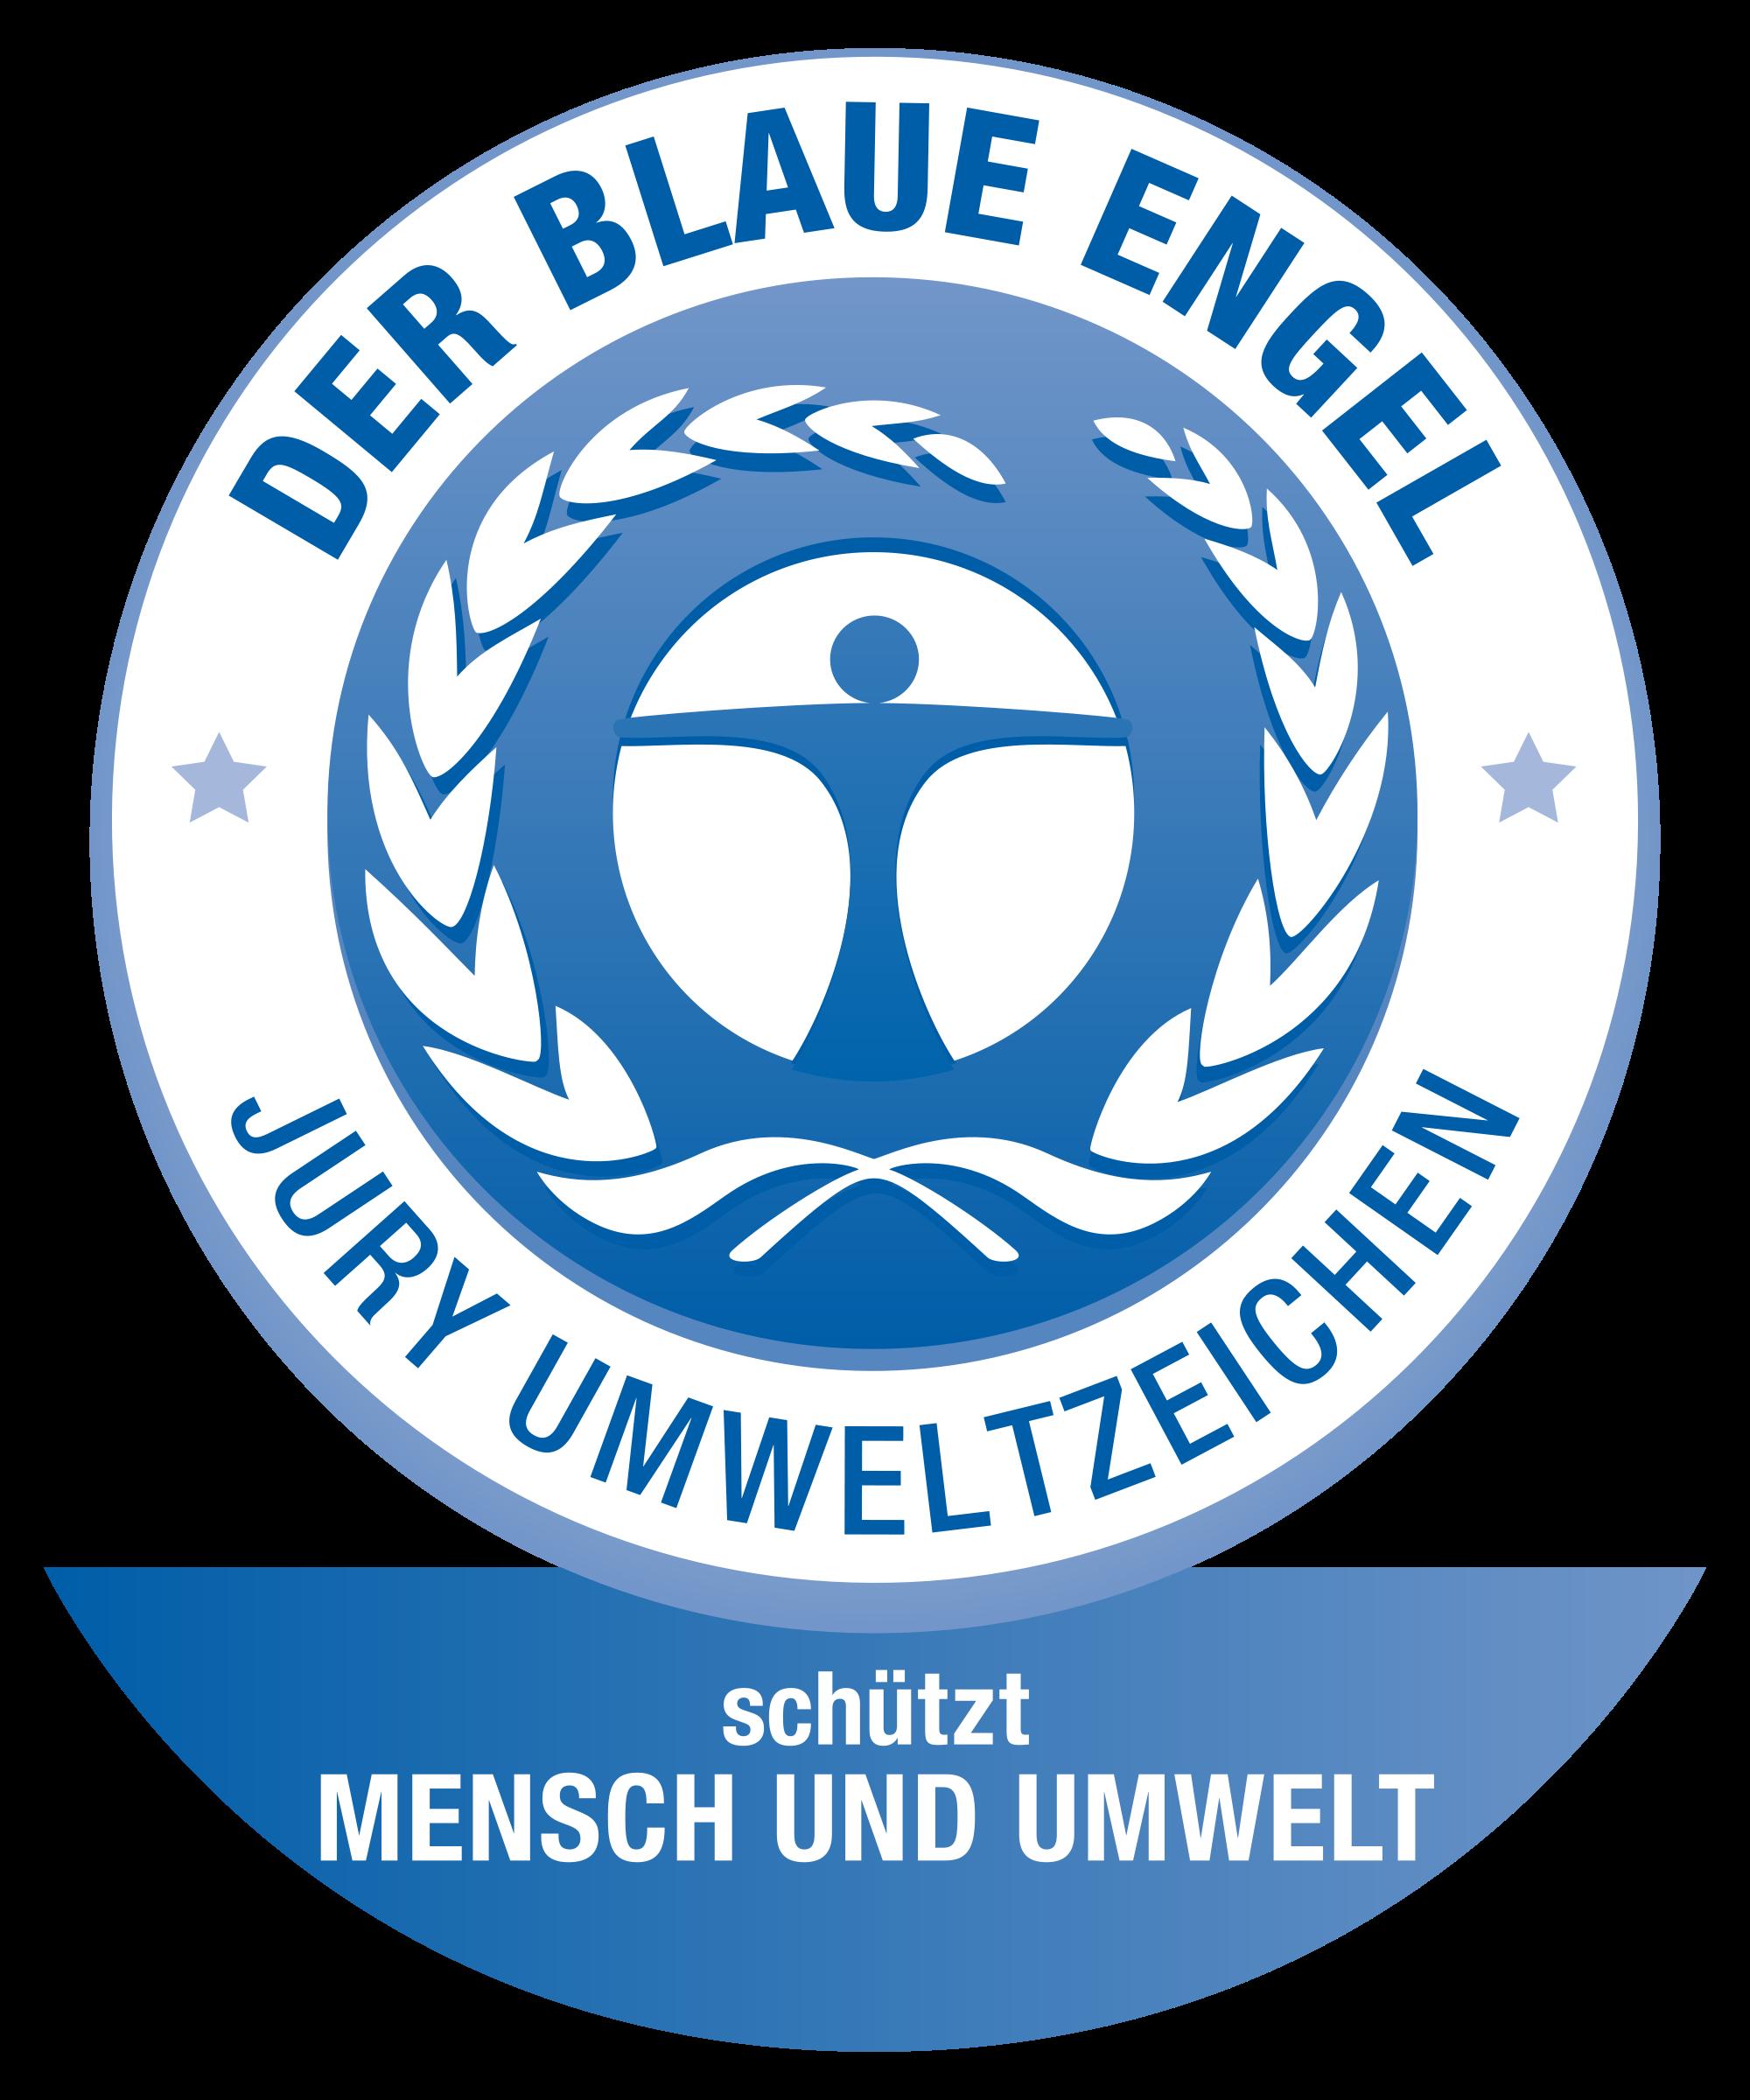 Brother Blauer Engel Zertifizierung